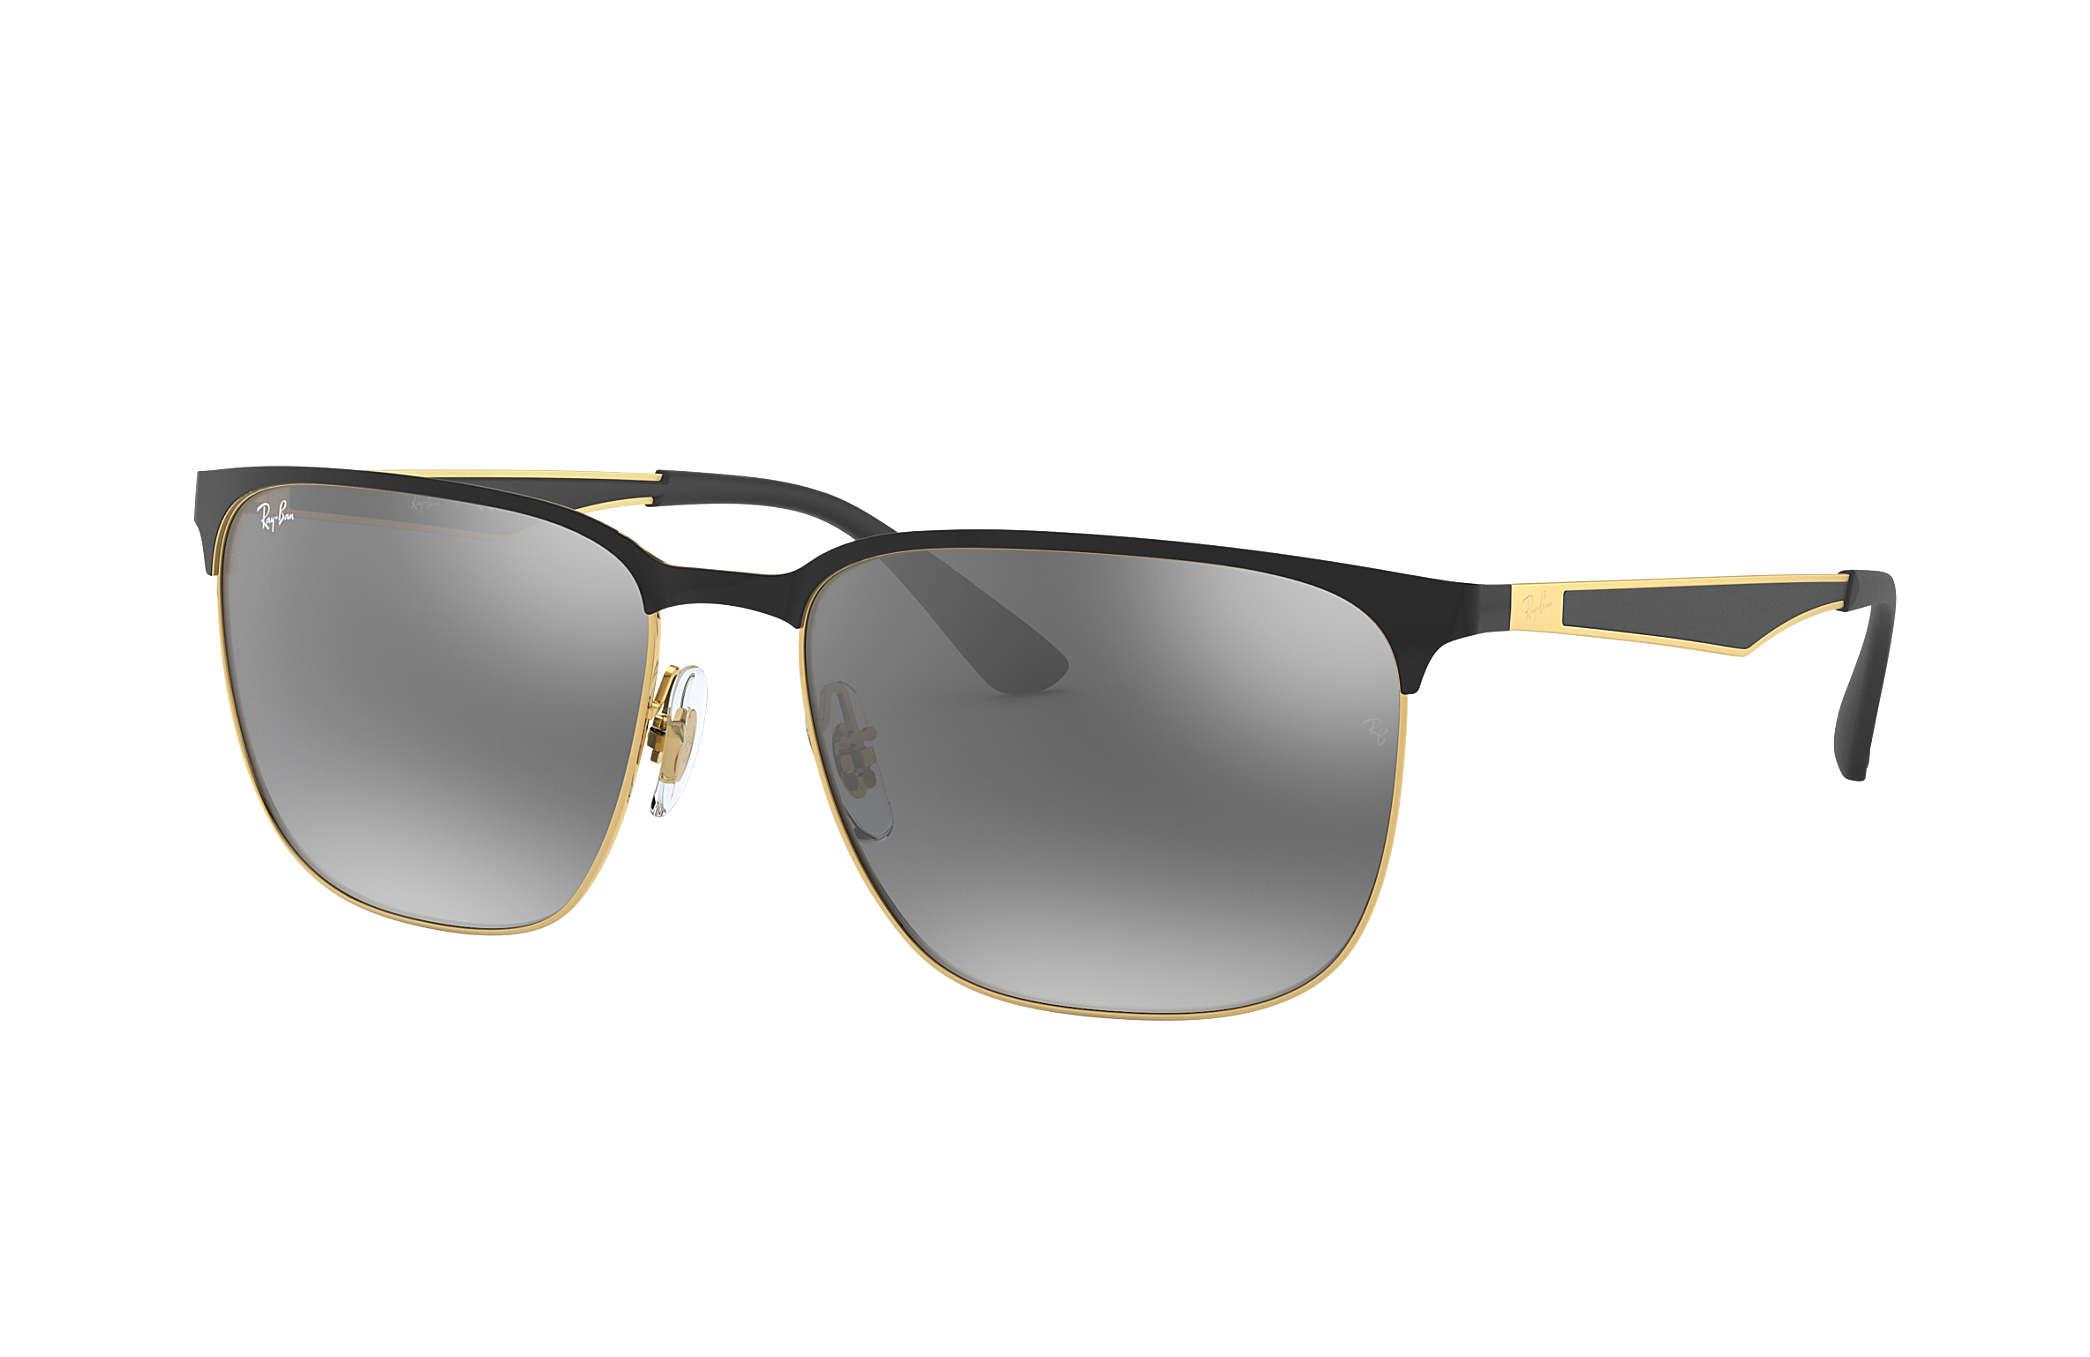 Metal Half Rim Square Sunglasses in Gold Black Silver Mirror RB3569 187/88 59 Ray-Ban gyDzTDA